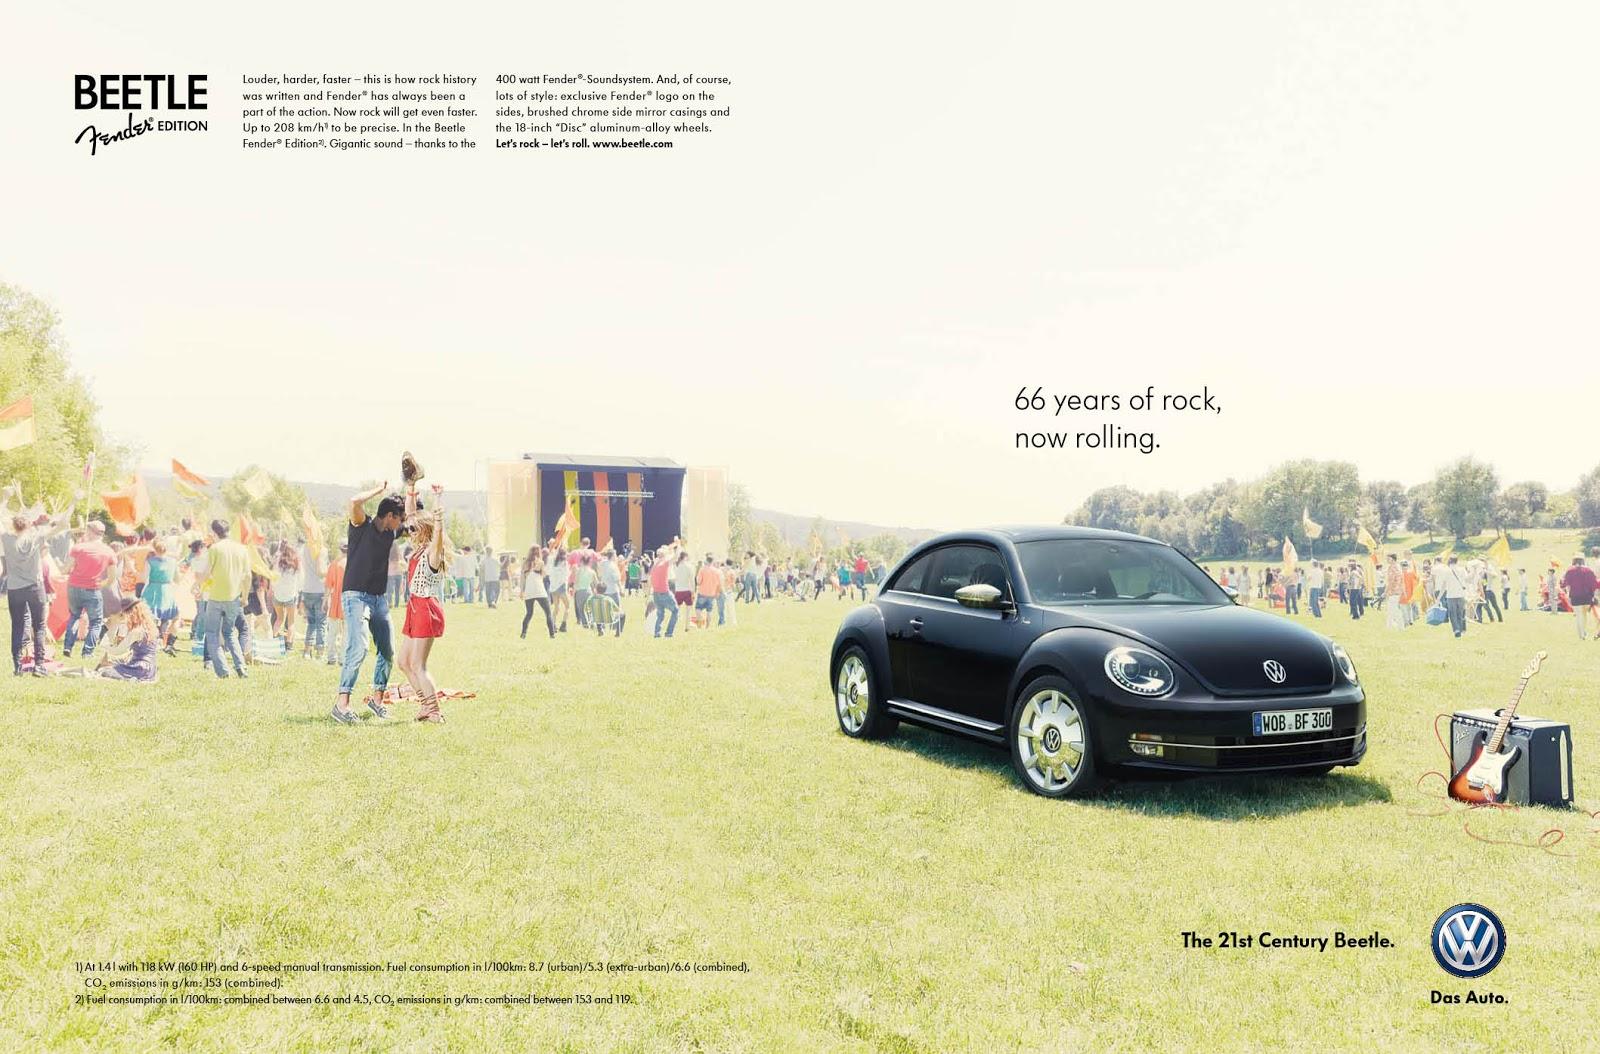 volkswagen vw beetle fender edition print ads   sorry